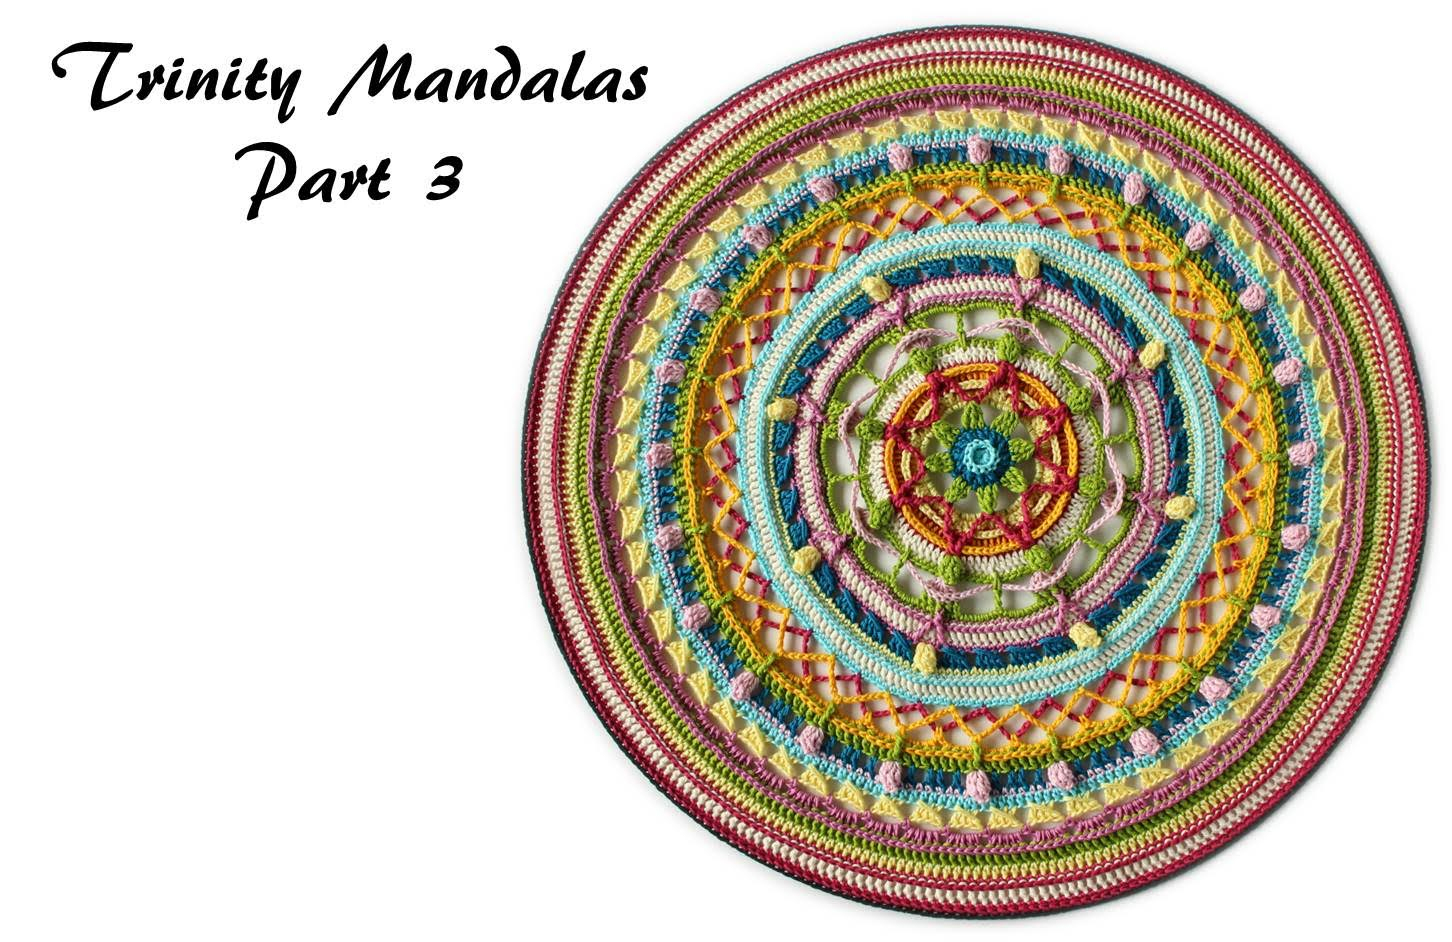 Trinity Mandalas Part 3 – Free Crochet Pattern | It's All In concernant Mandala Fée